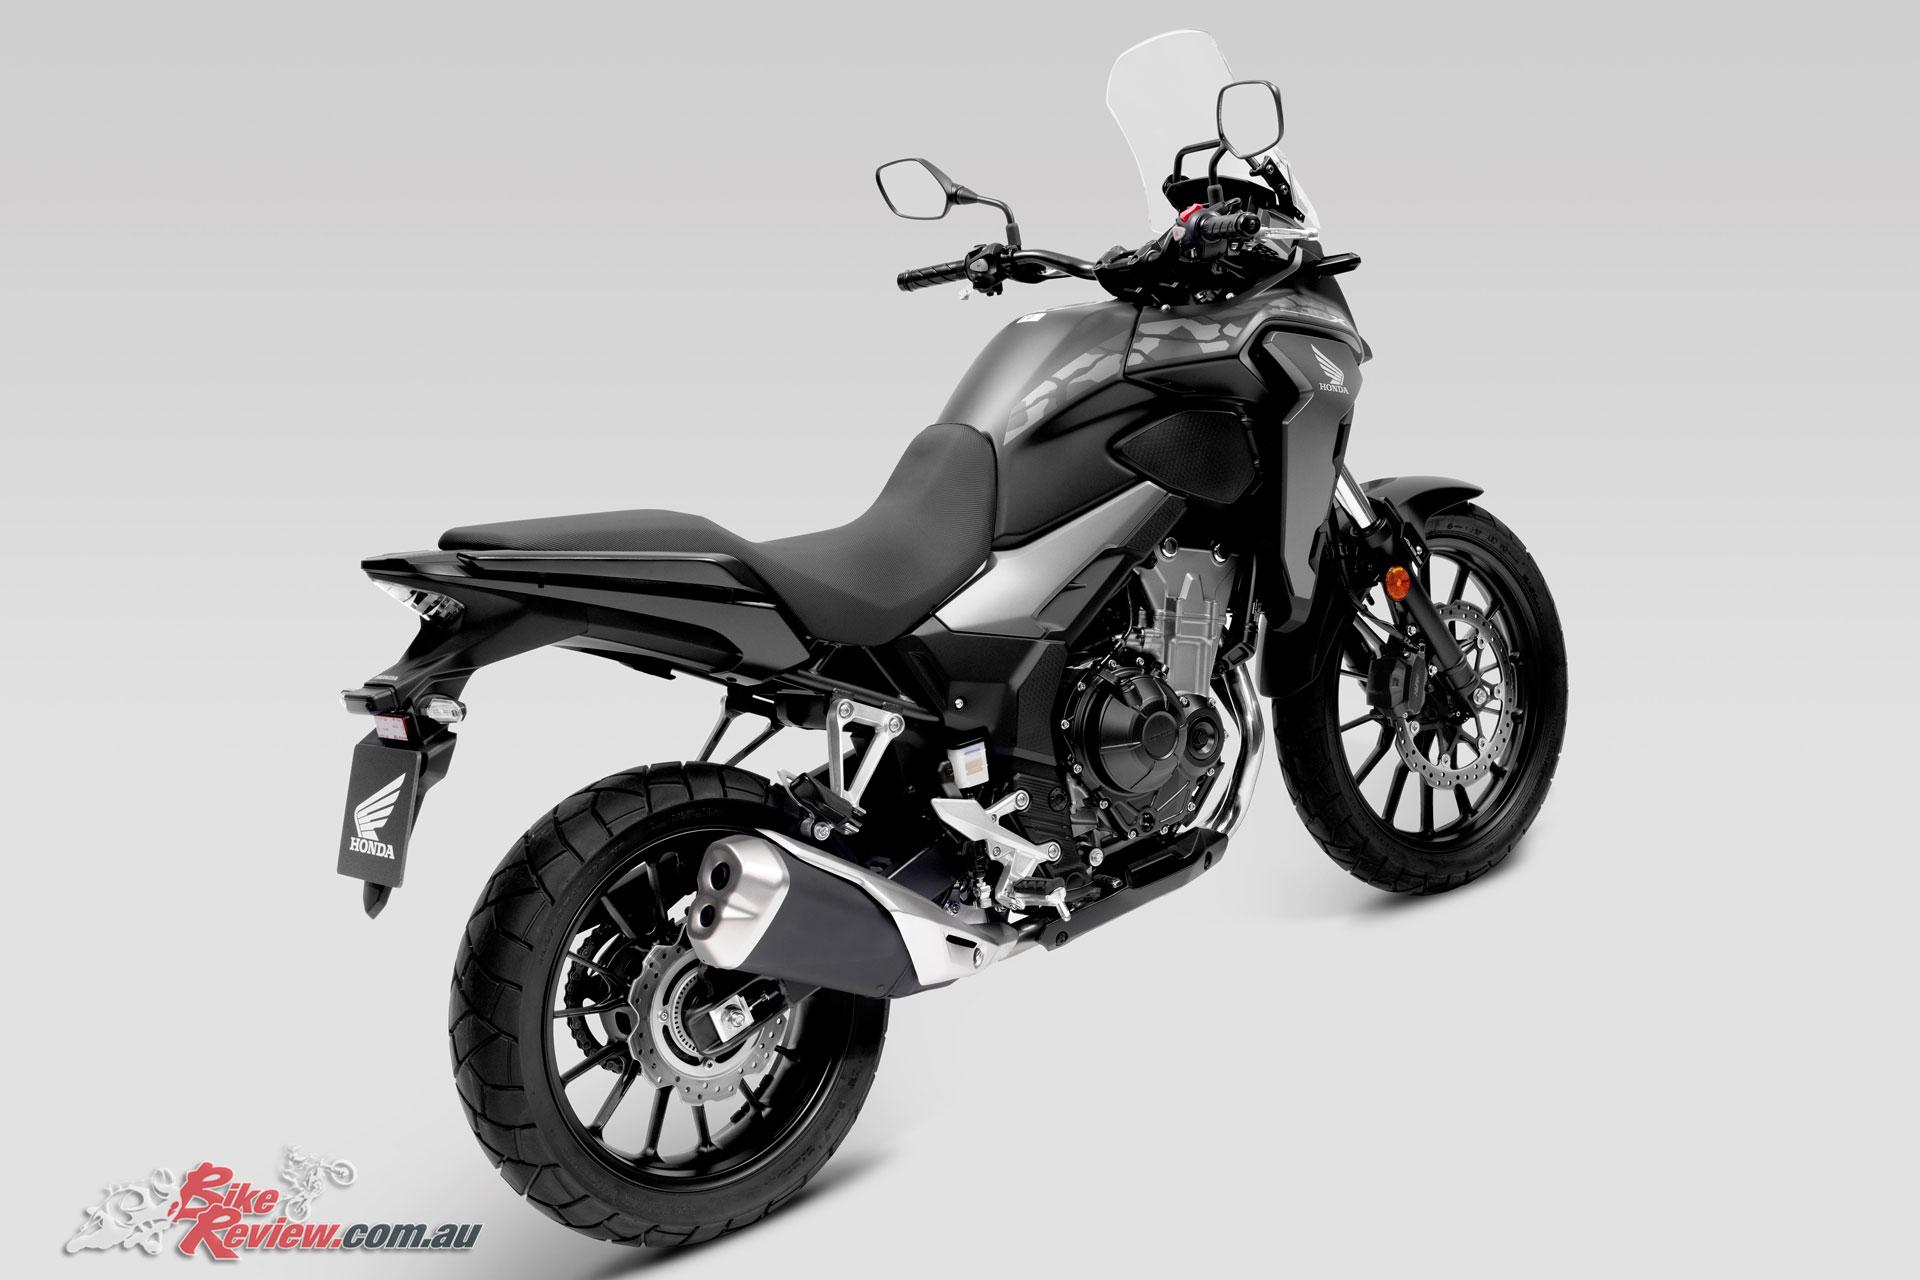 model update 2019 honda cb500 twins bike review. Black Bedroom Furniture Sets. Home Design Ideas